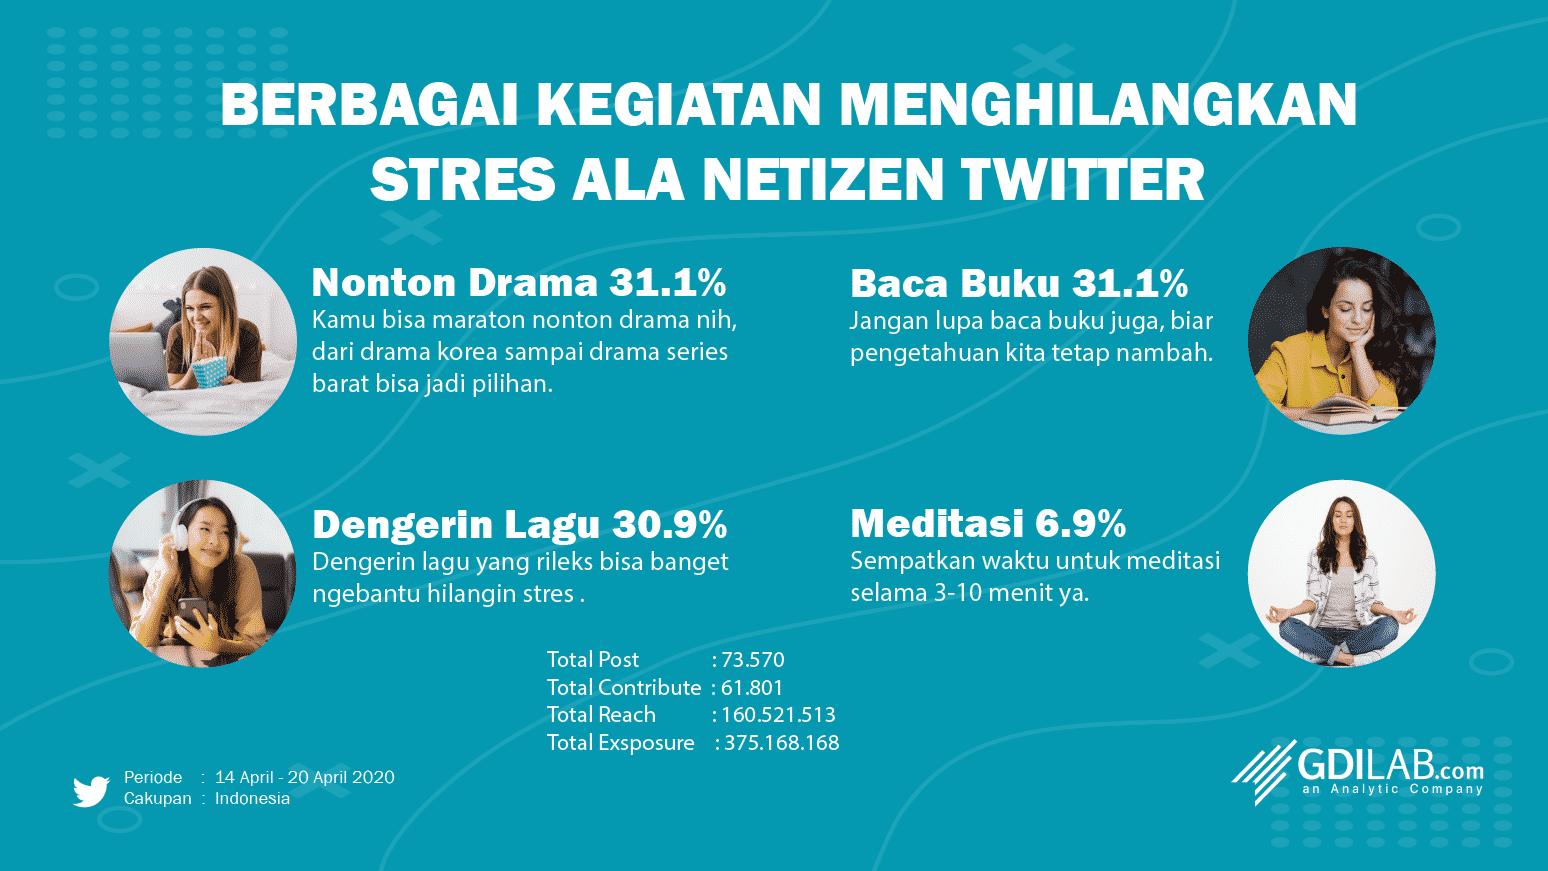 4 Kegiatan Menghilangkan Stress Selama di Rumah Aja ala Netizen Twitter gdilab